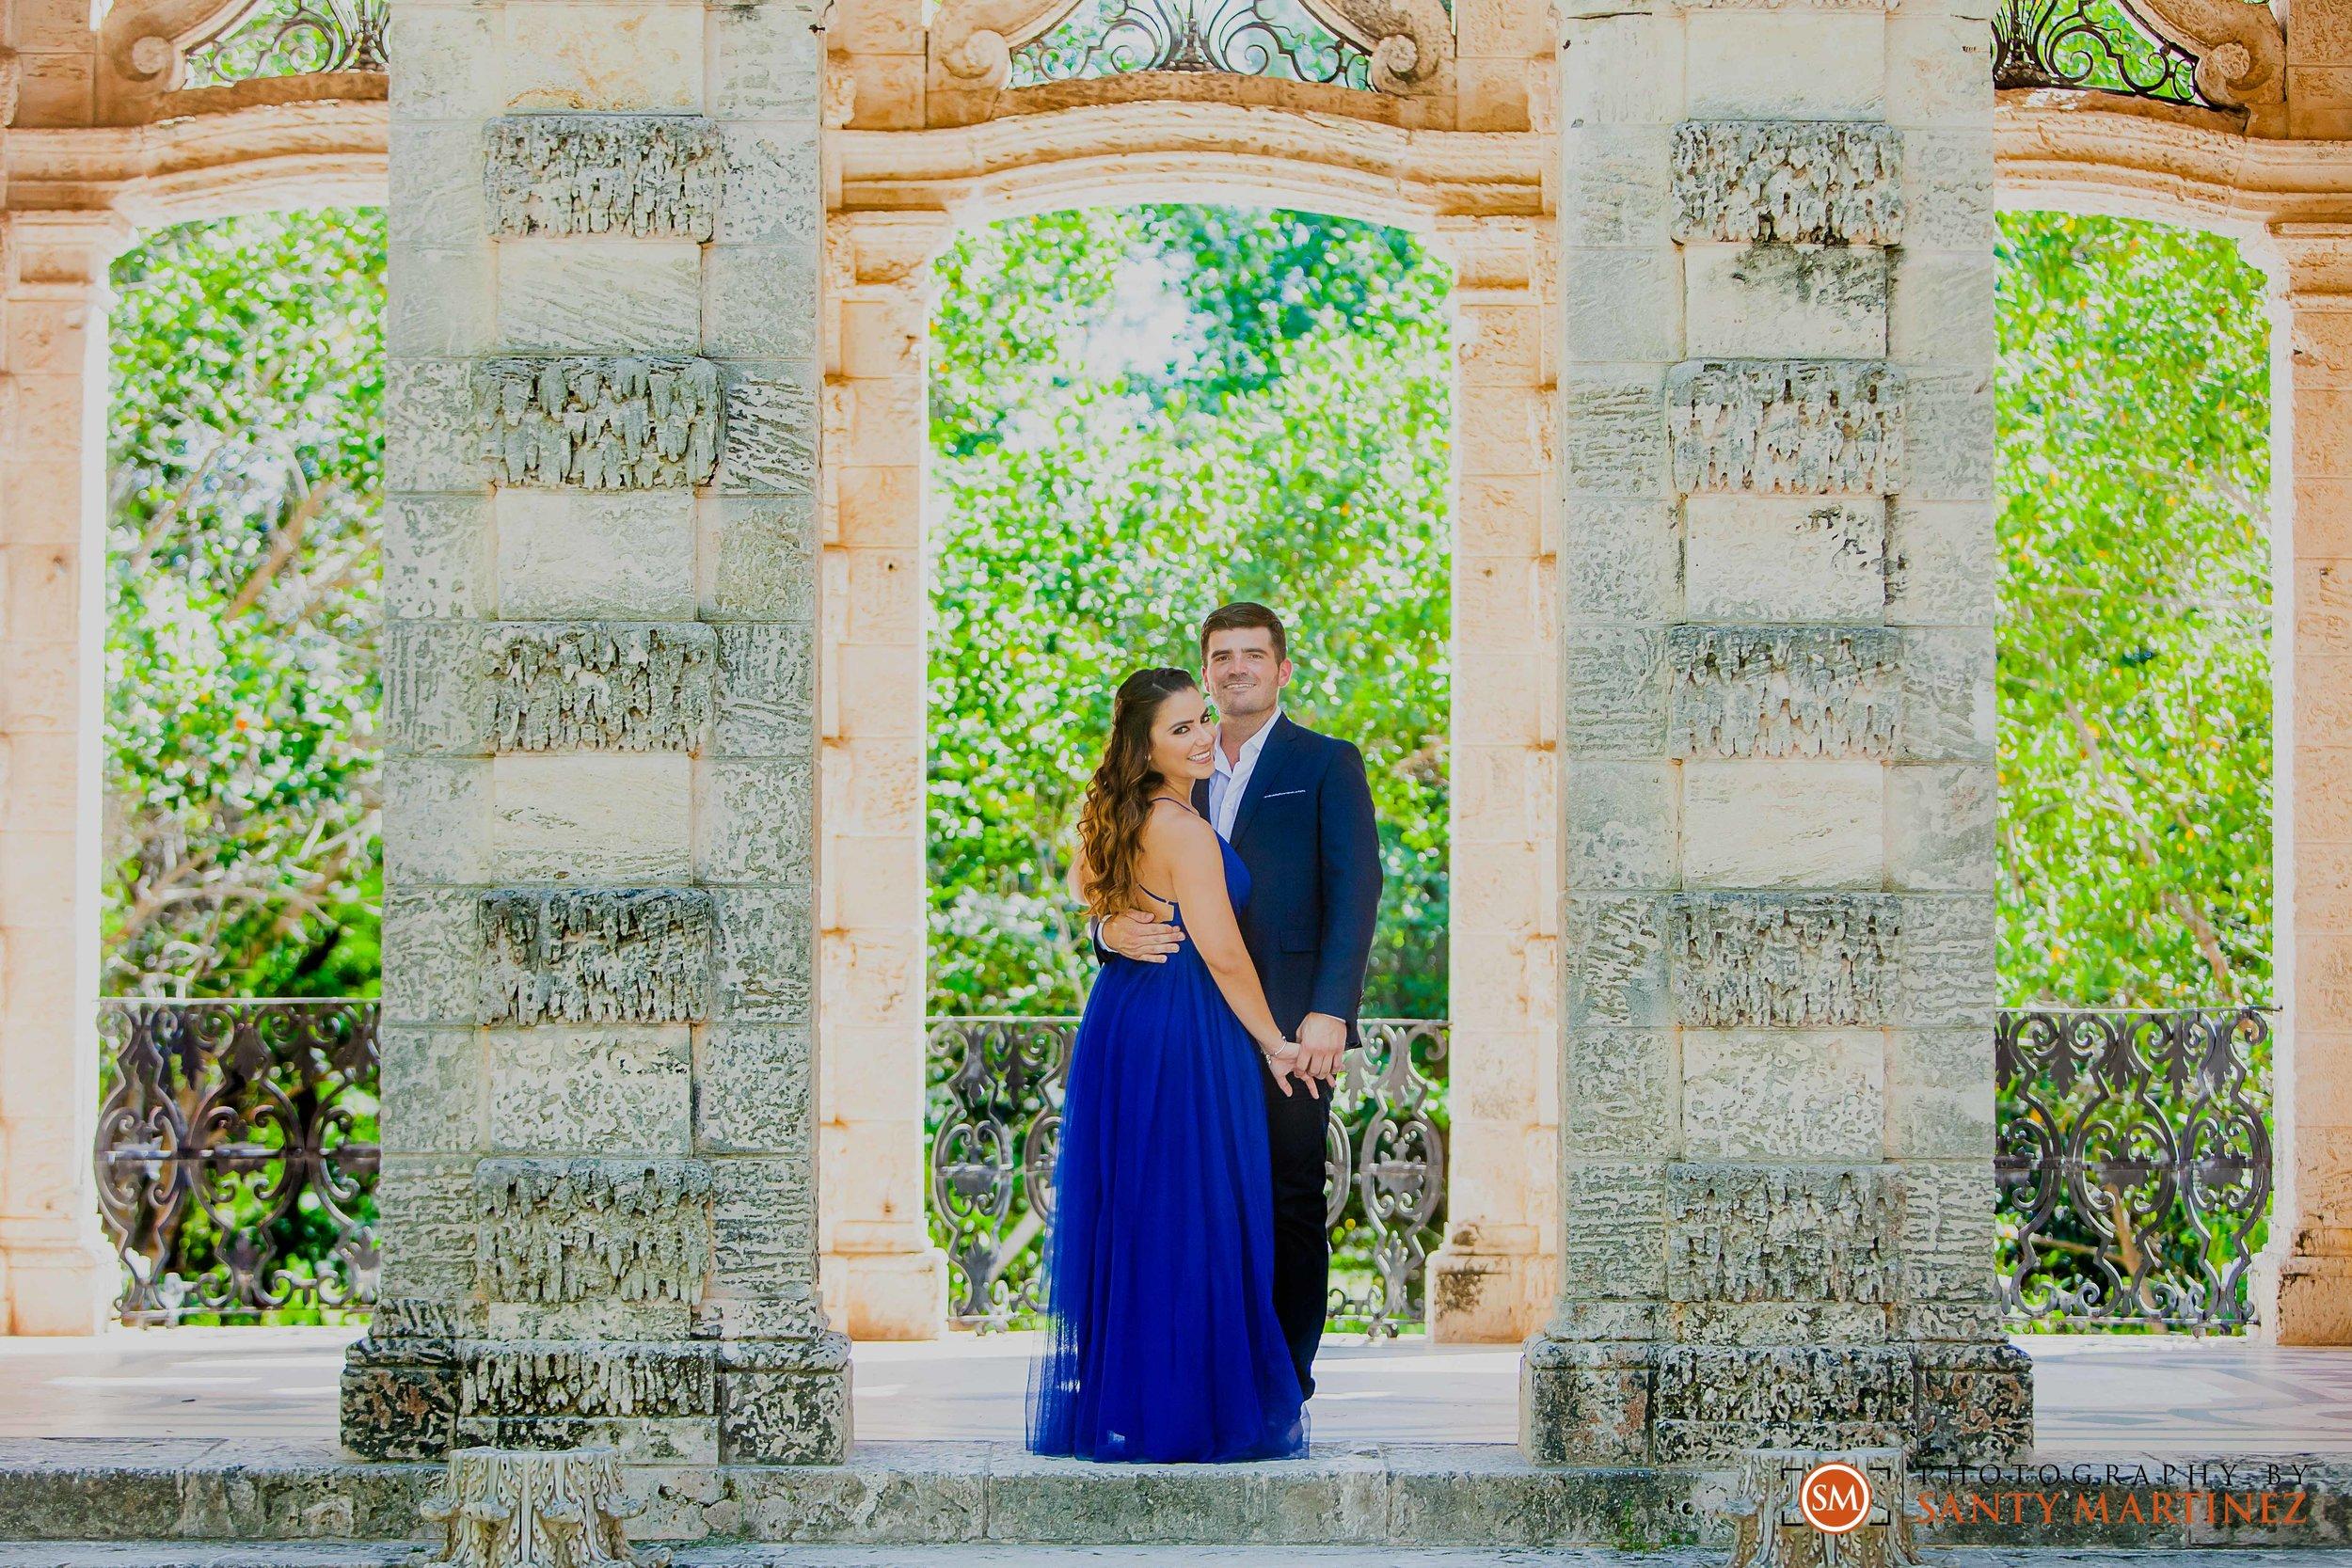 Engagement Session - Vizcaya - Photography by Santy Martinez-8.jpg